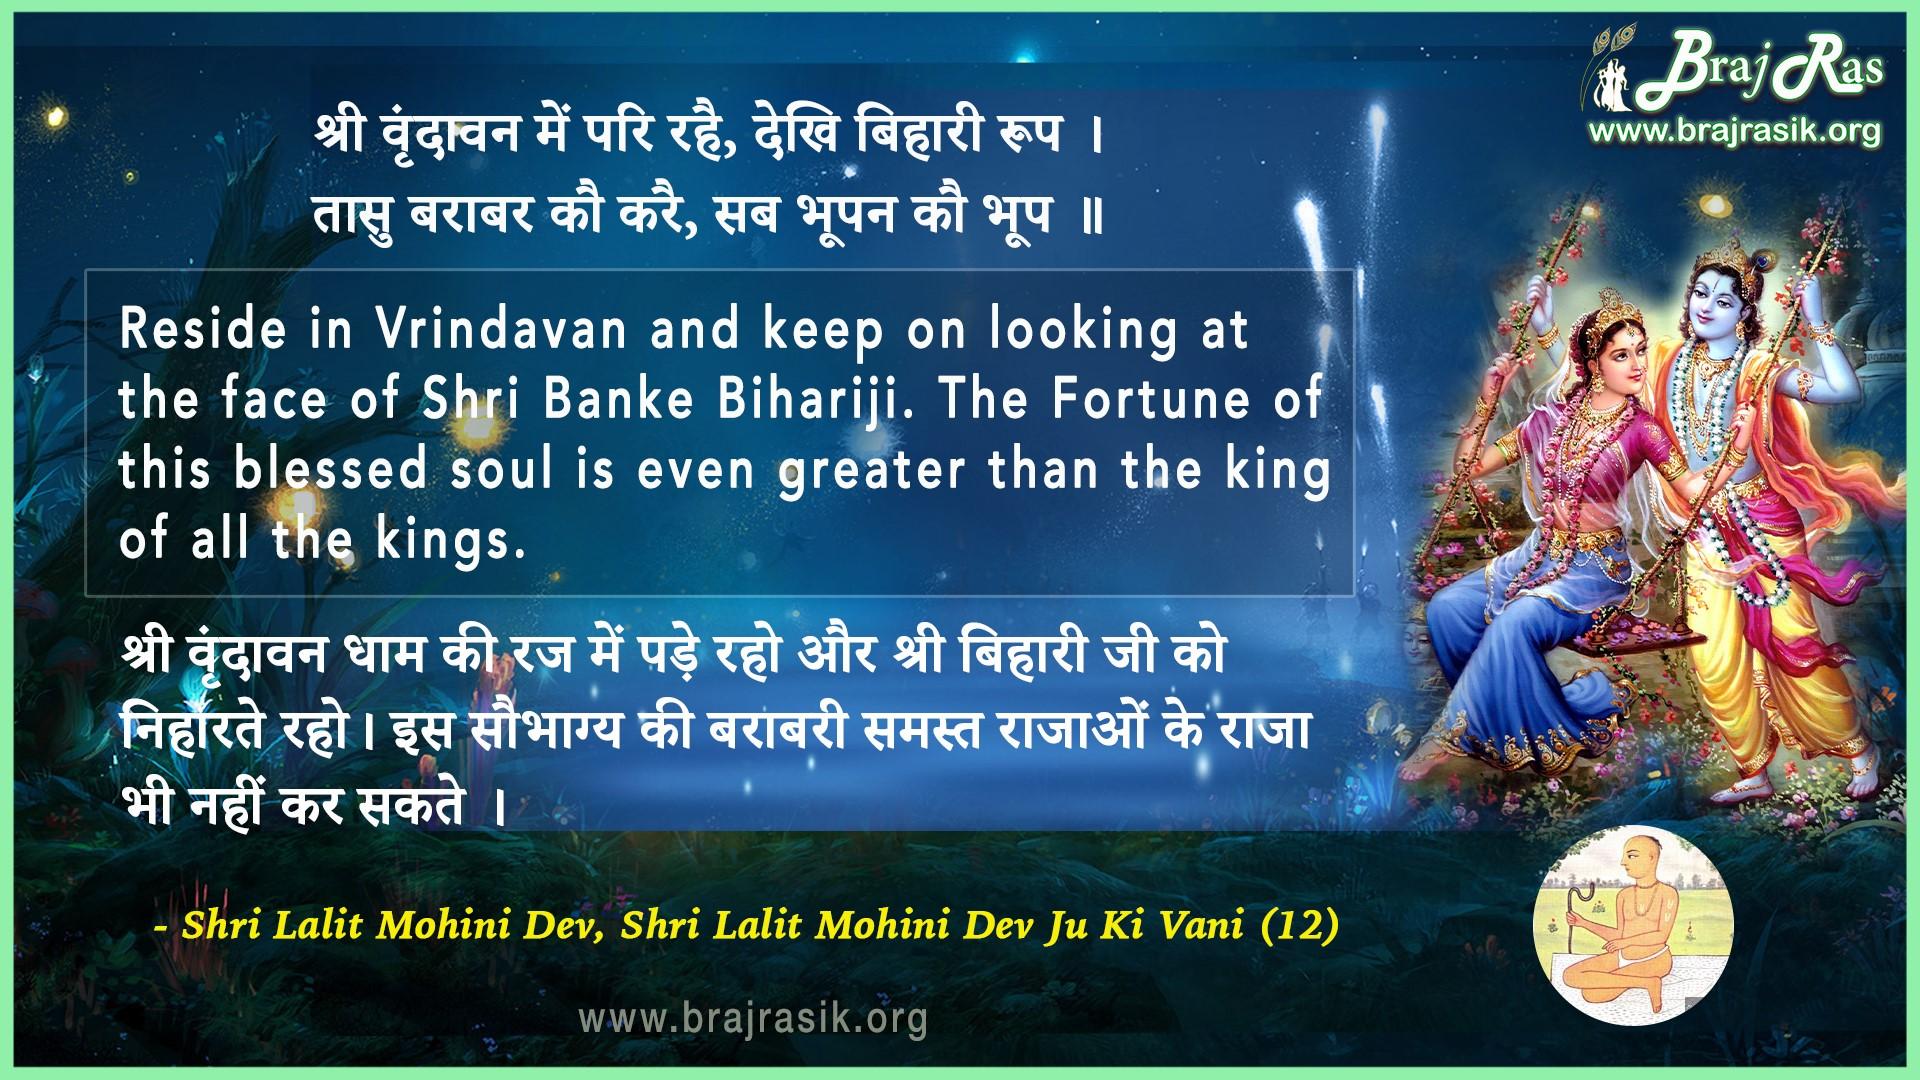 Shri vrindavan mein pari rahai - Shri Lalit Mohini Dev, Shri Lalit Mohini Dev Ju Ki Vani (12)